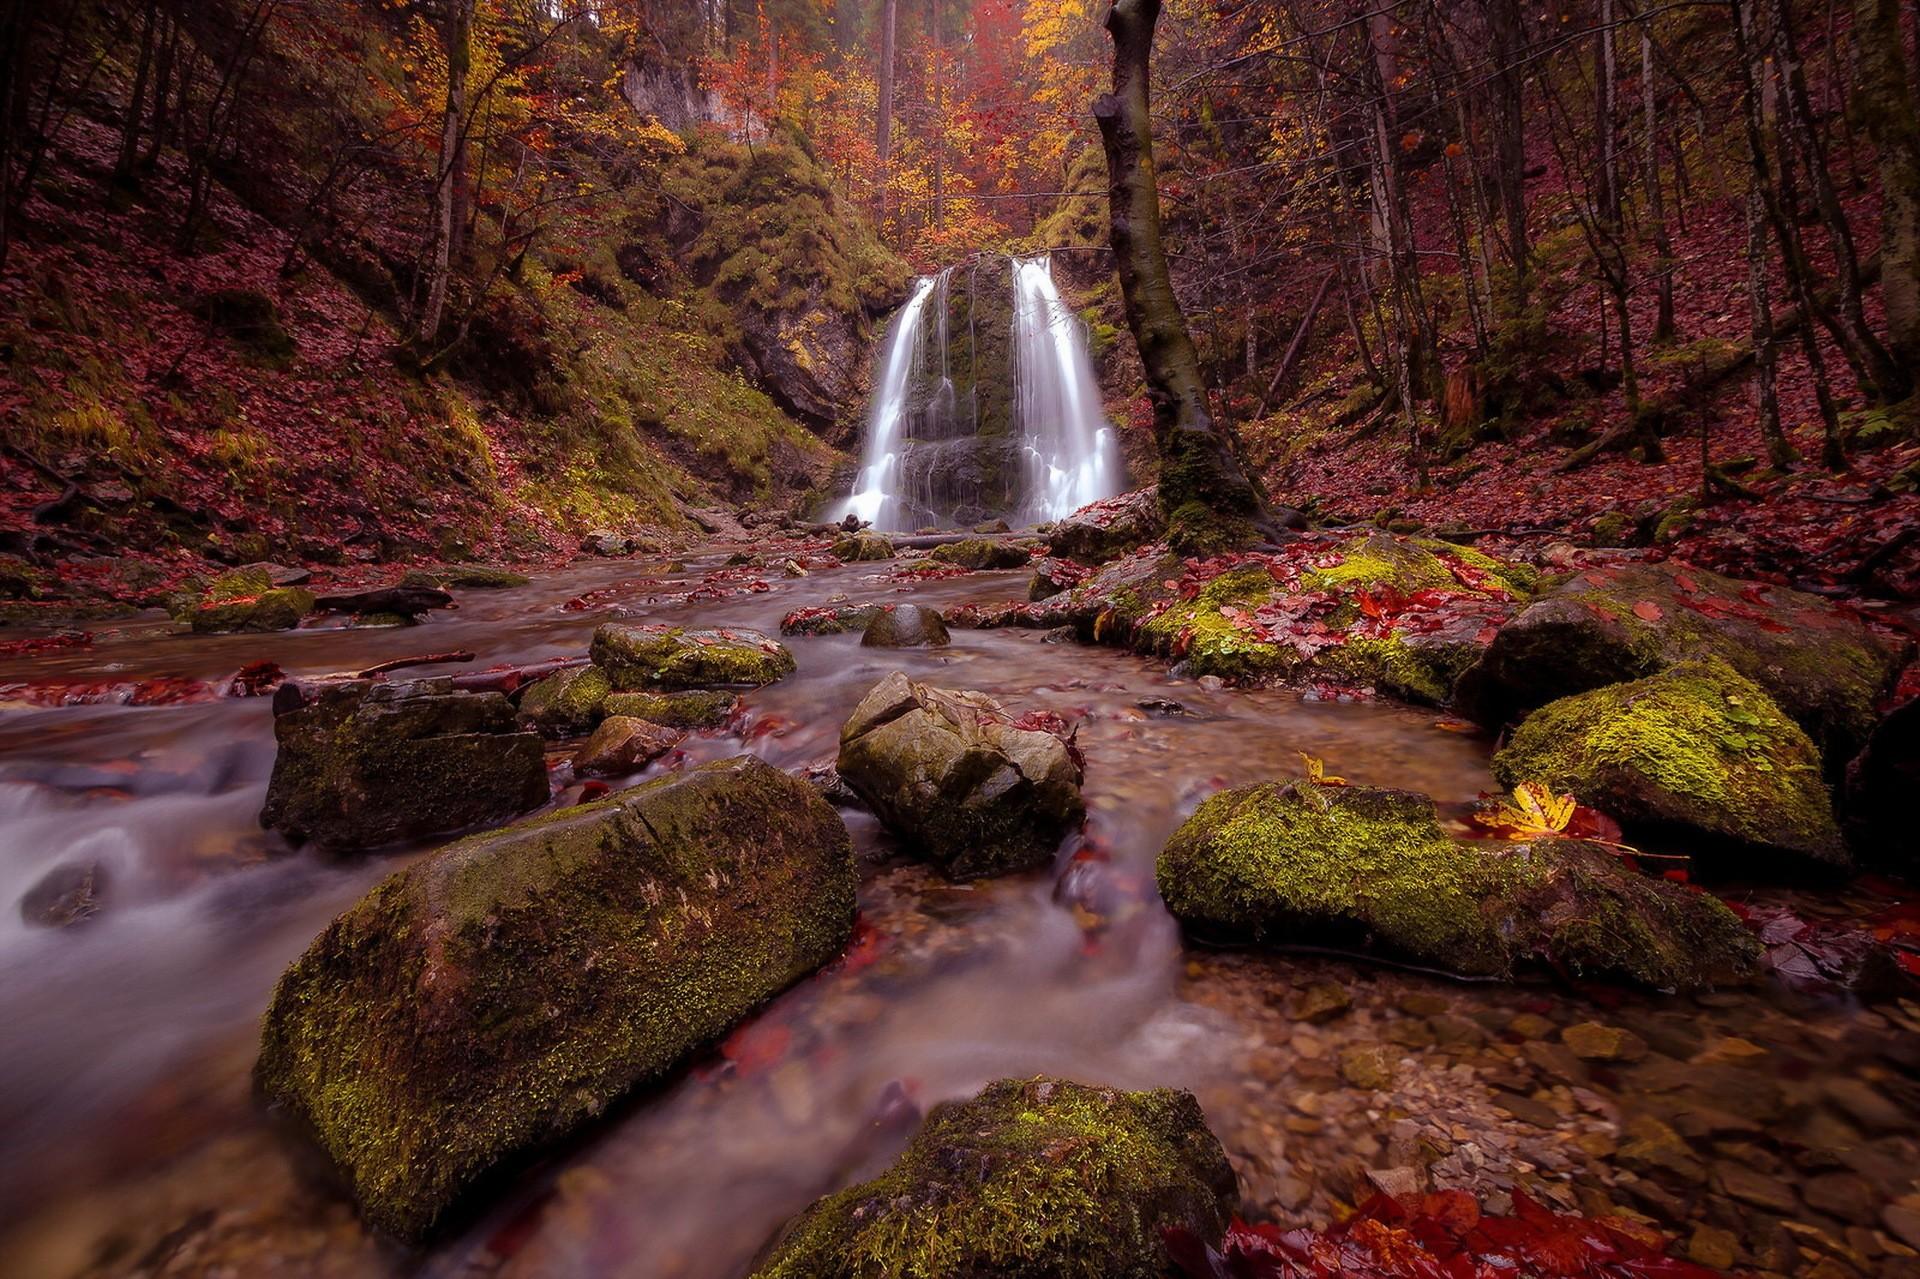 General 1920x1279 landscape waterfall nature creeks rocks moss fall fallen leaves forest